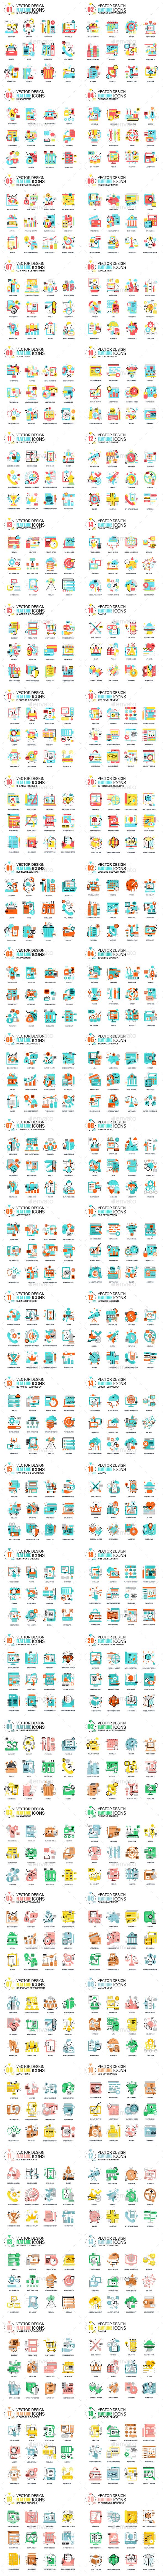 Set of Flat Design Icons - Icons